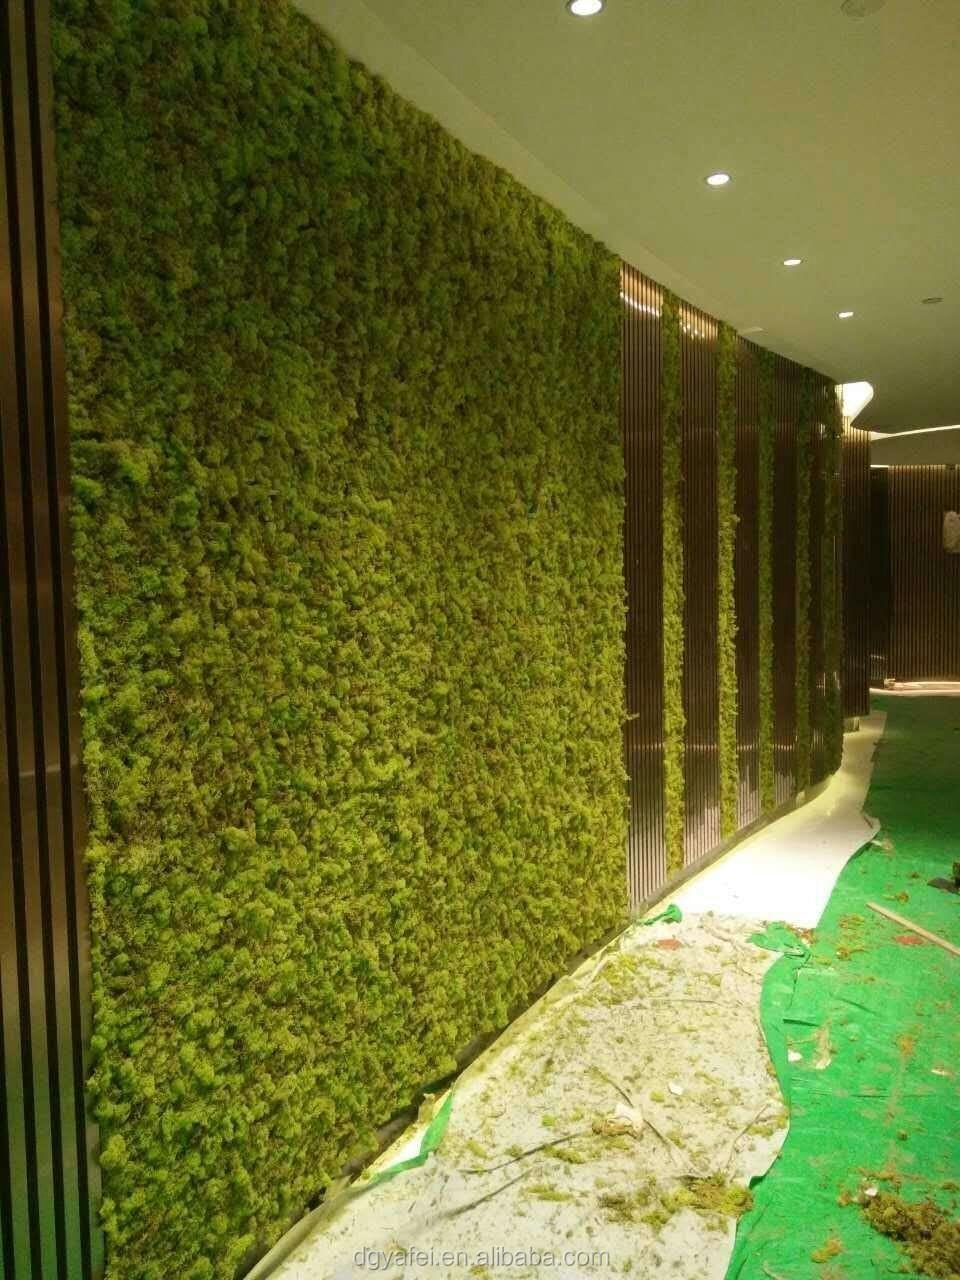 Enchanting Moss Wall Decor Pattern - Wall Art Collections ...